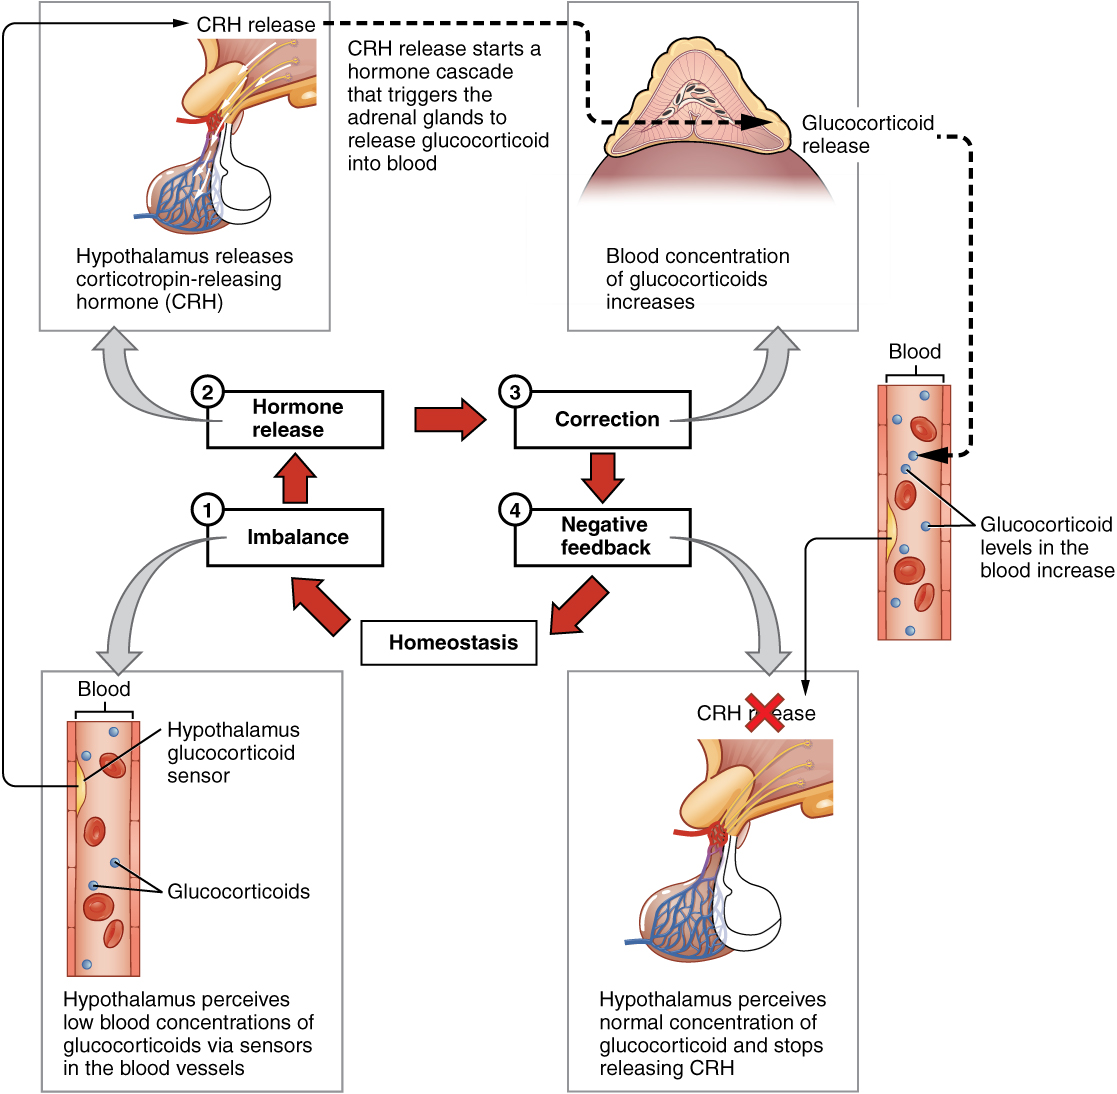 hormonal regulation of stress – ovulation, regulation of female sex hormones – induces corpus luteum formation after ovulation • releases hormones in response to stress.